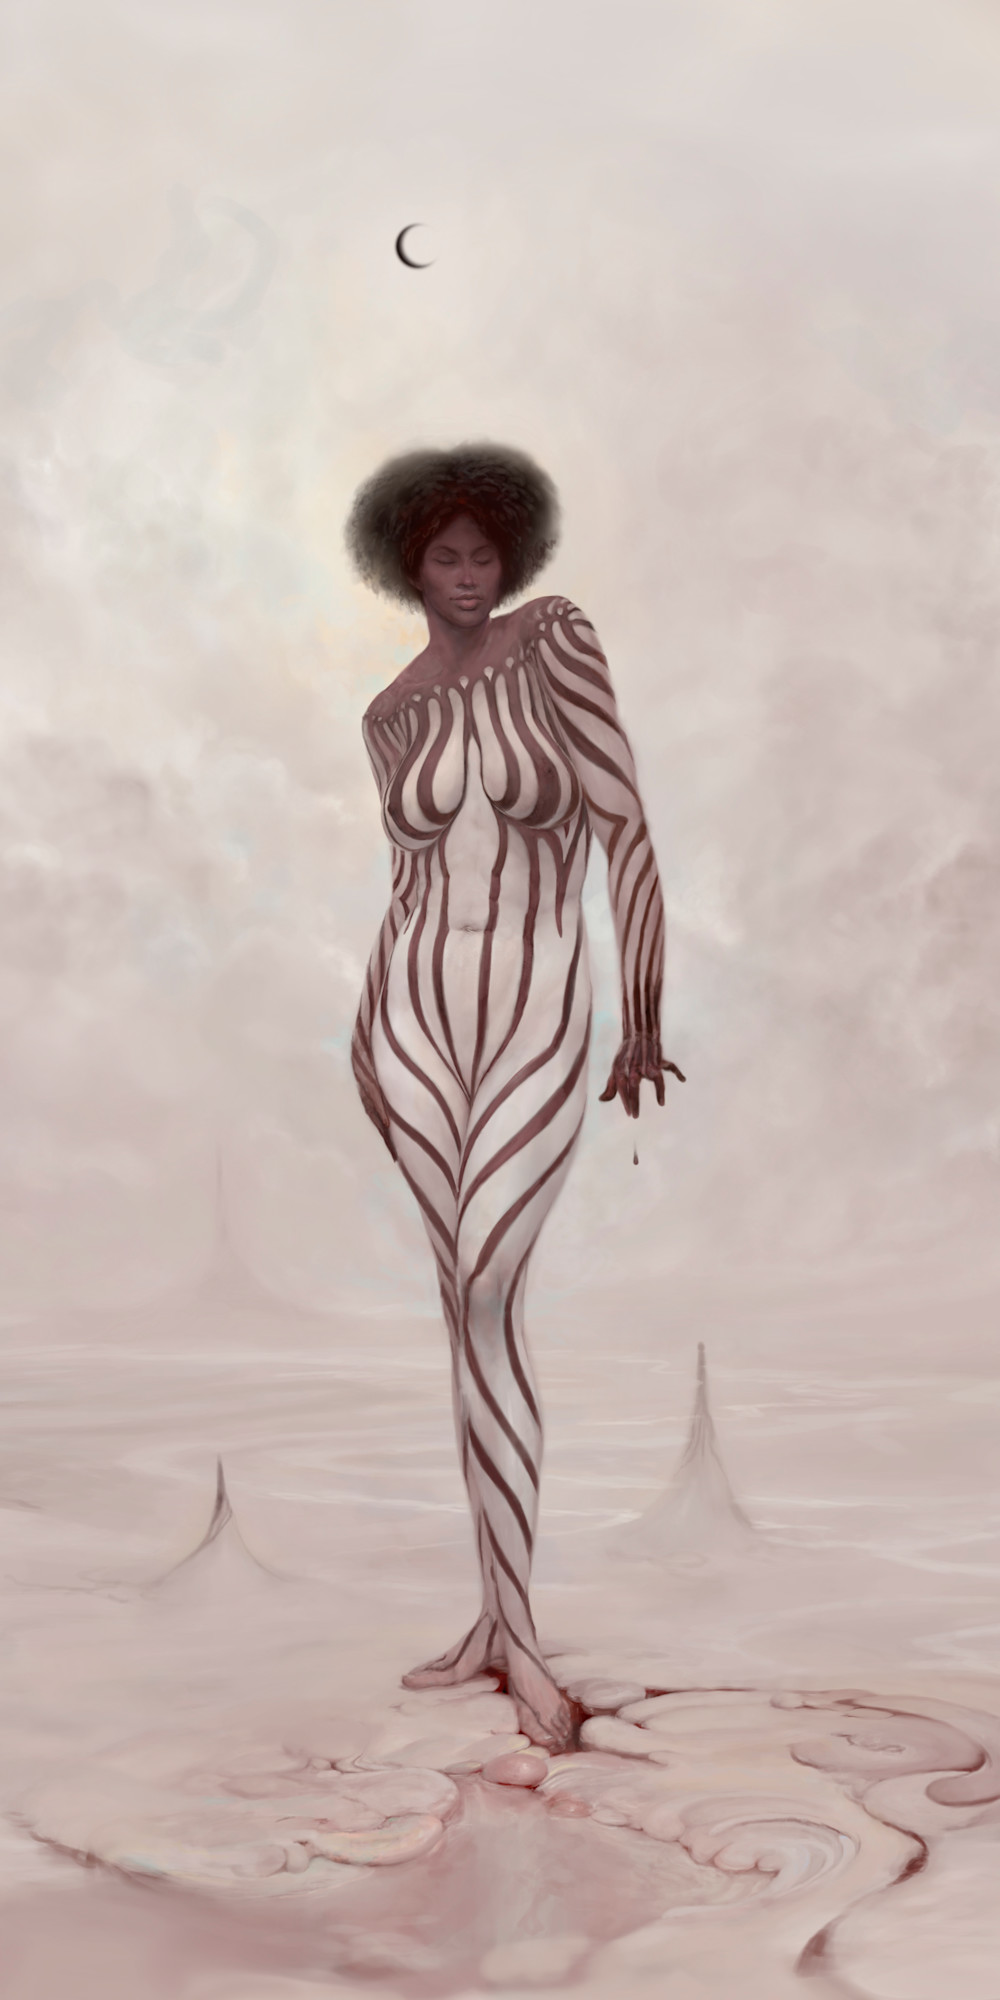 """ZEBRA,"" by Burton Gray, White Striped Nude Black Princess"